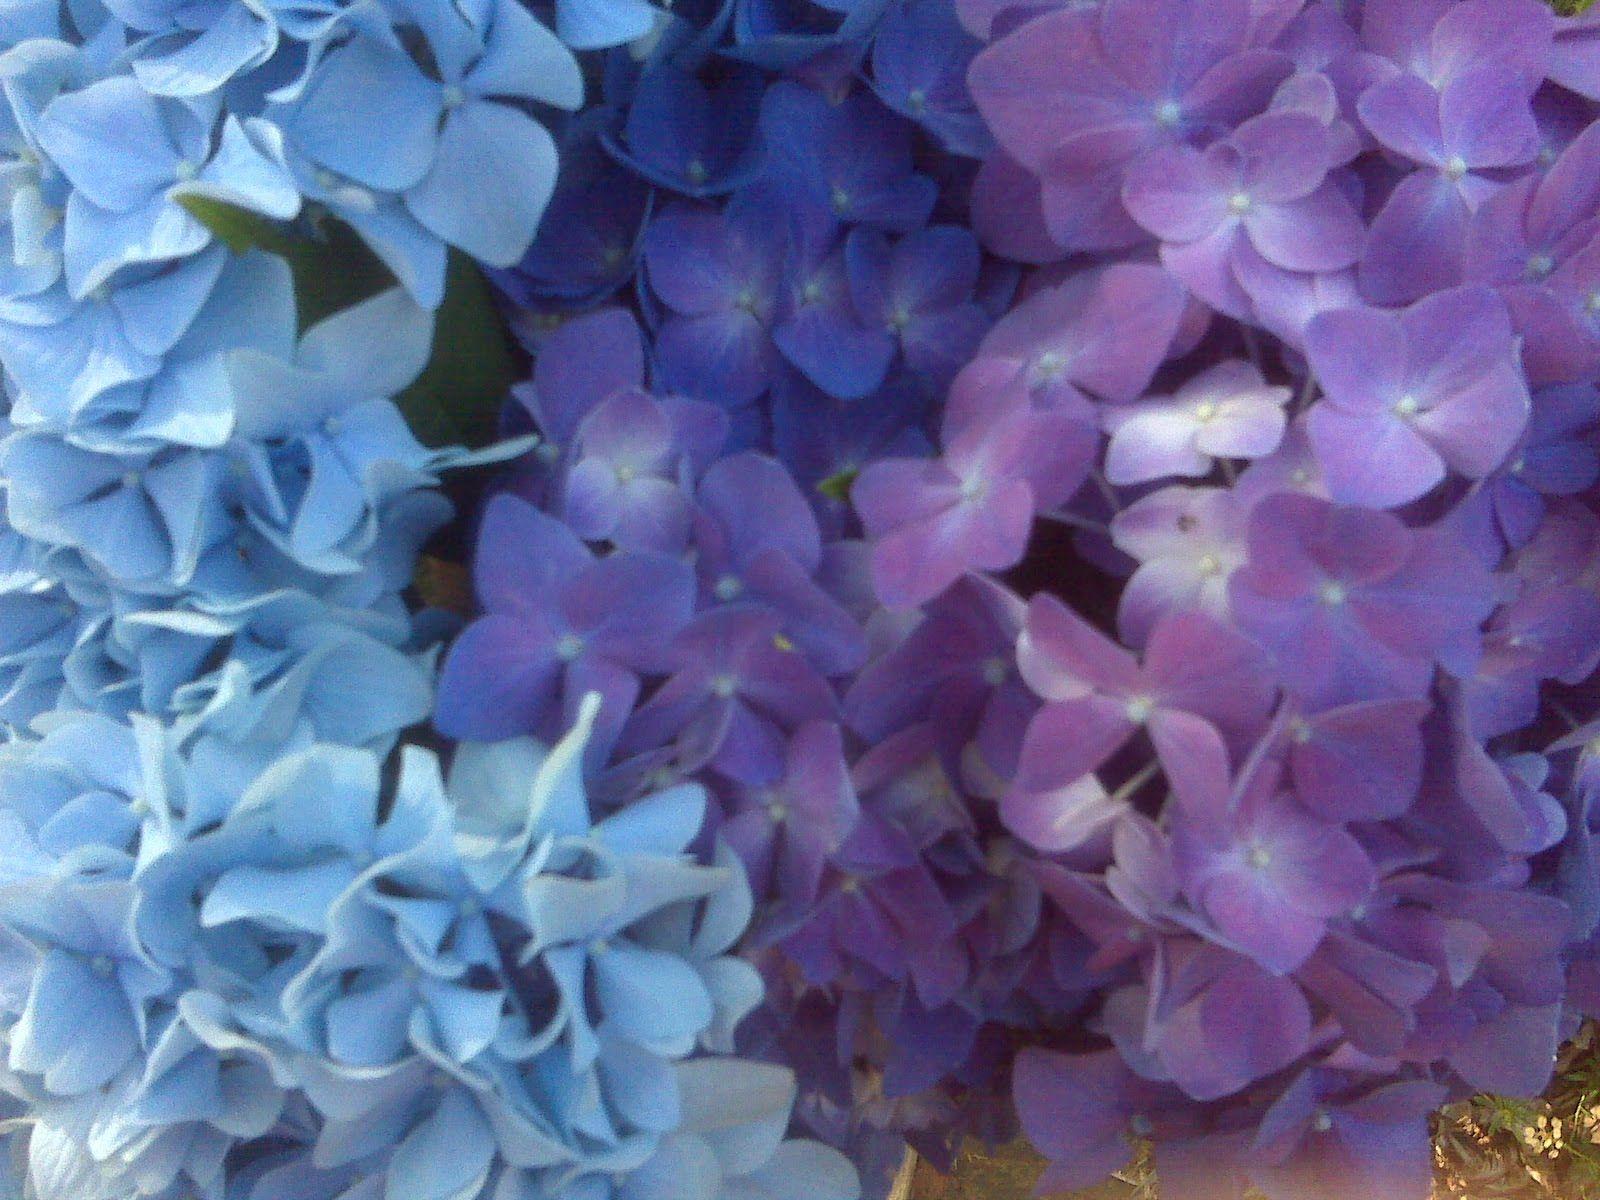 Purple Blue Hydrangeas With Lavendar Boquet For Weeks Now Here